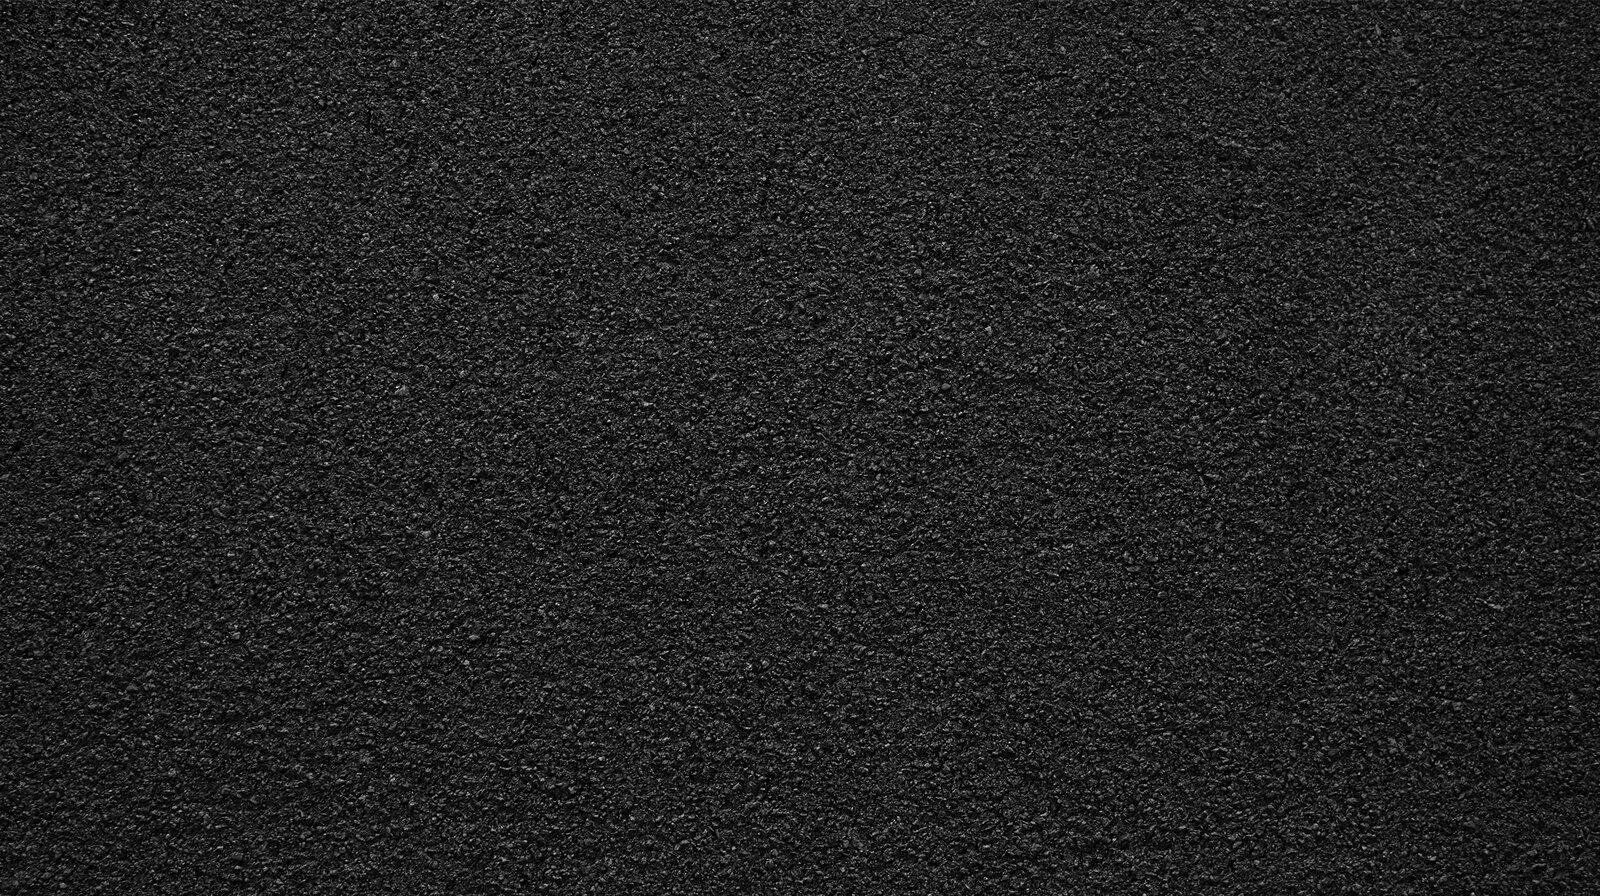 DuraKleen®沥青质清除服务